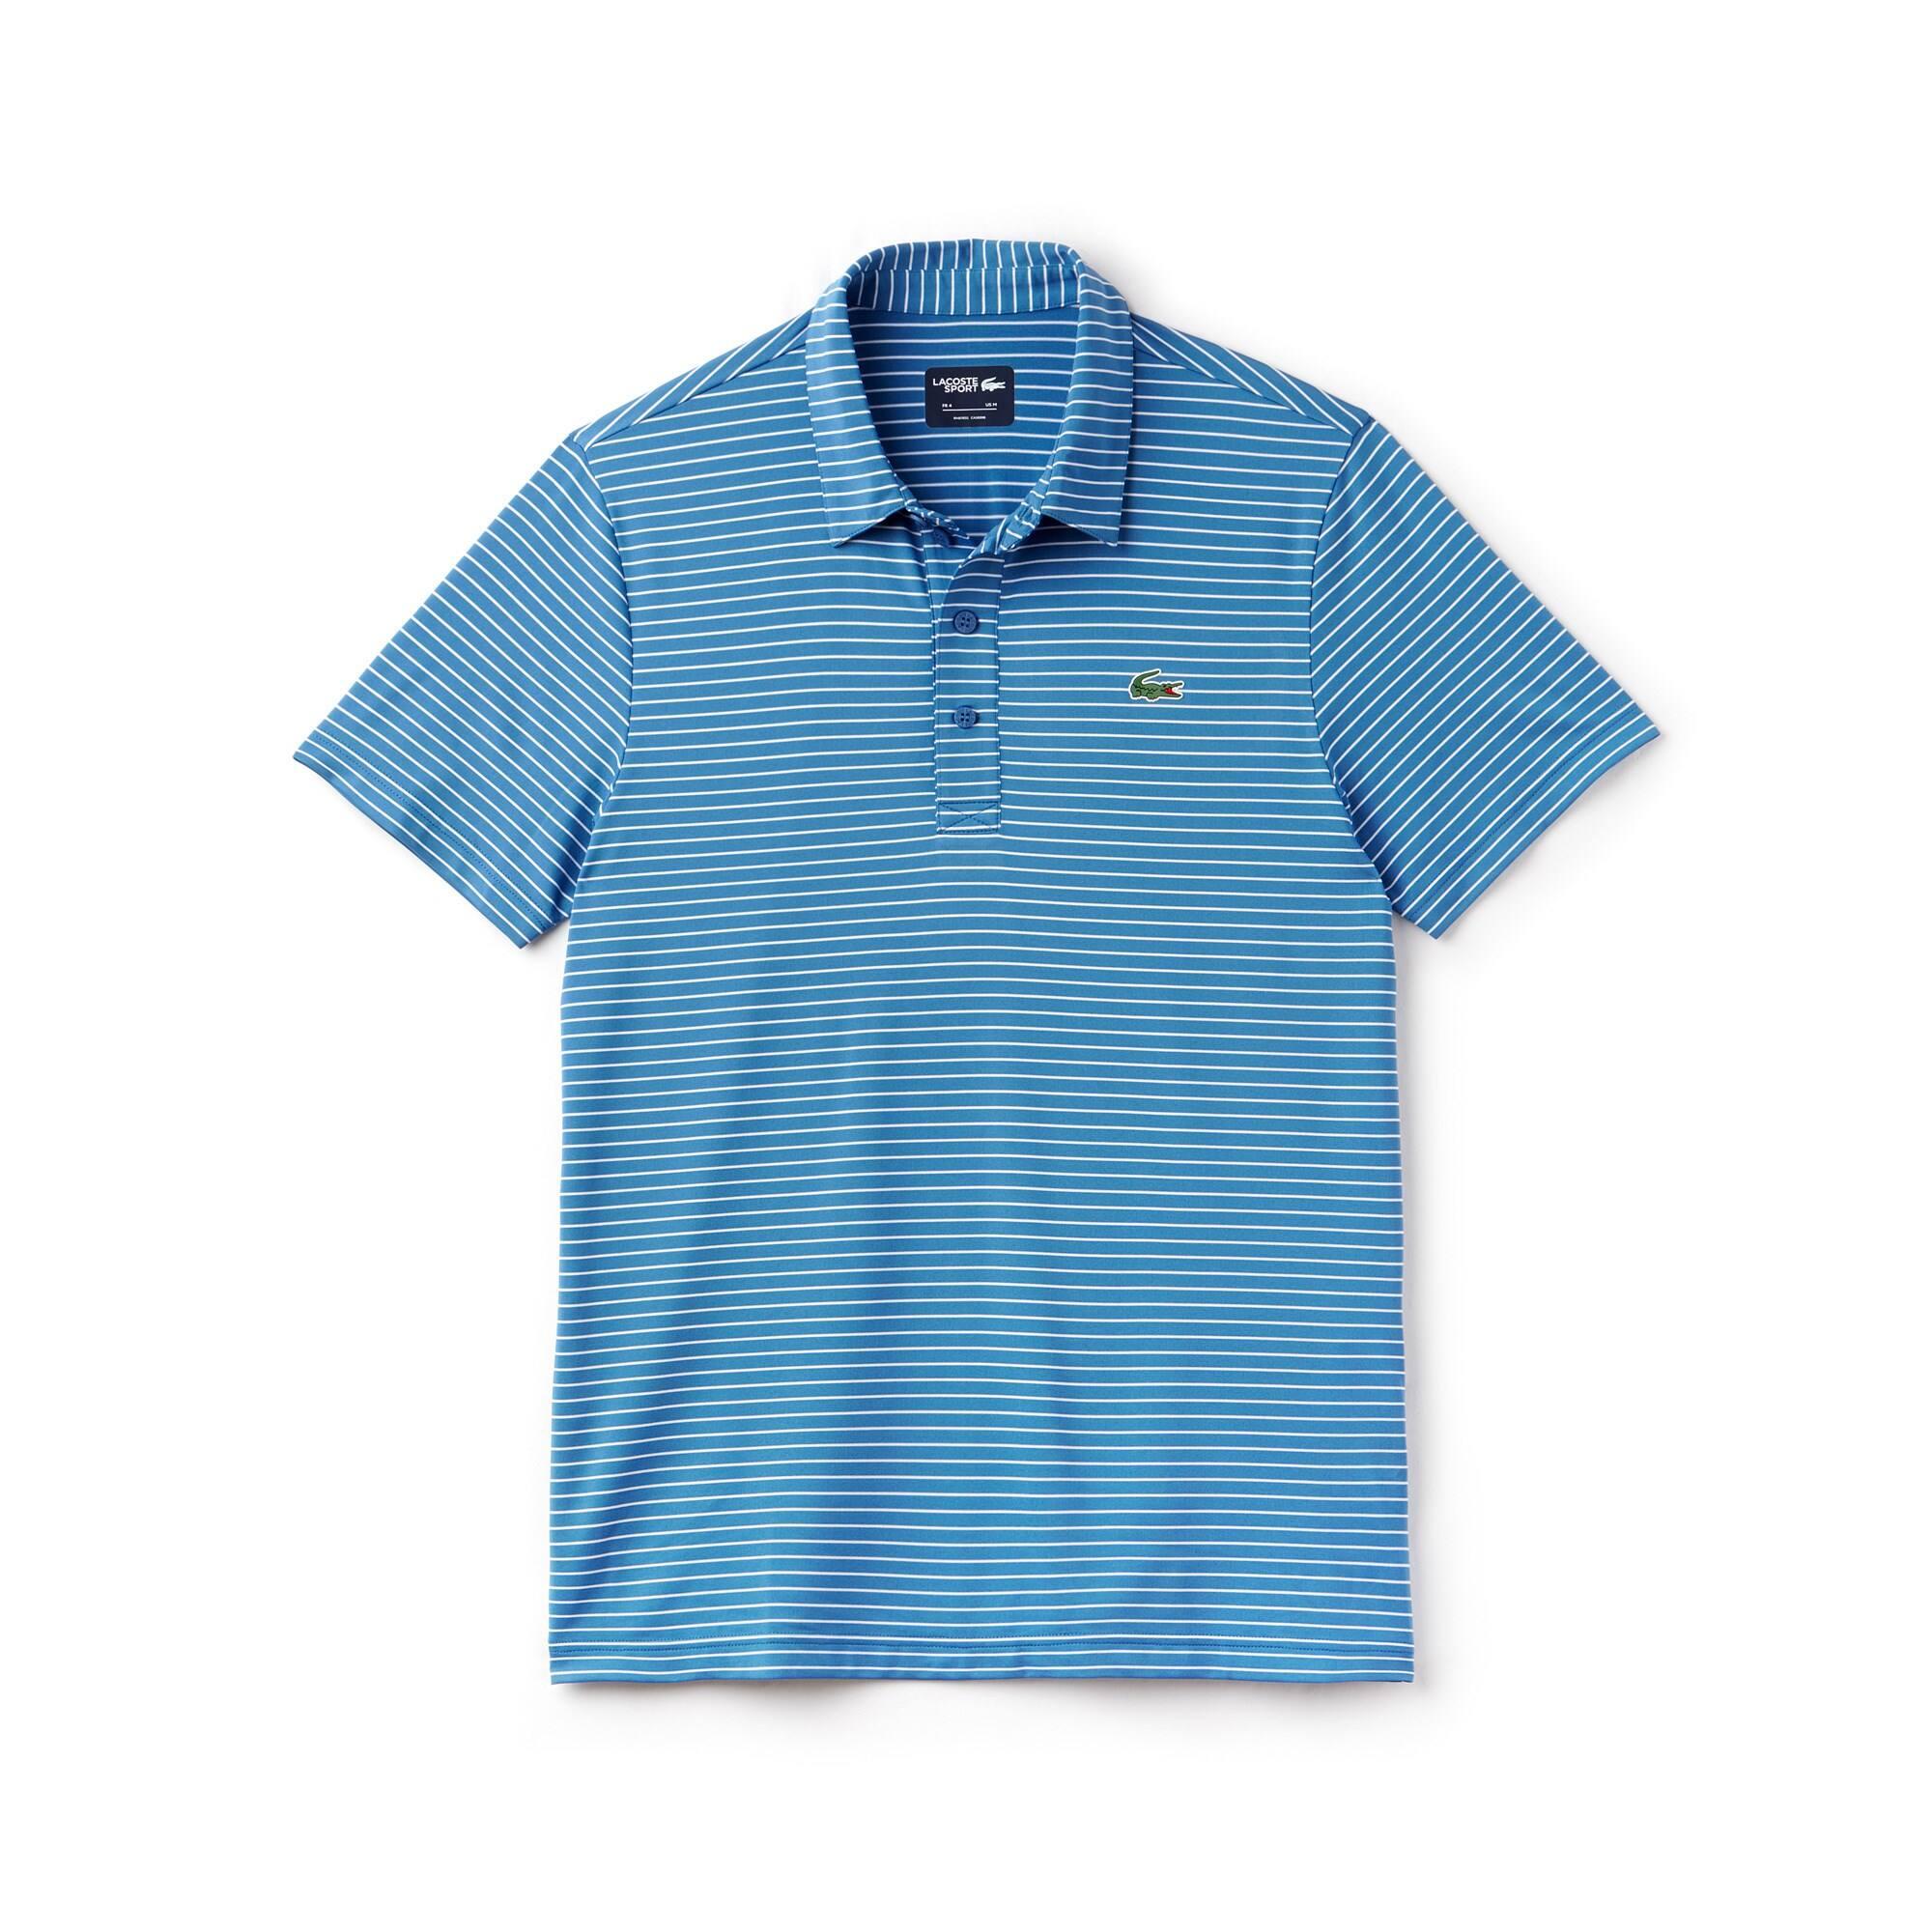 Men's Lacoste SPORT Striped Stretch Technical Jersey Golf Polo Shirt